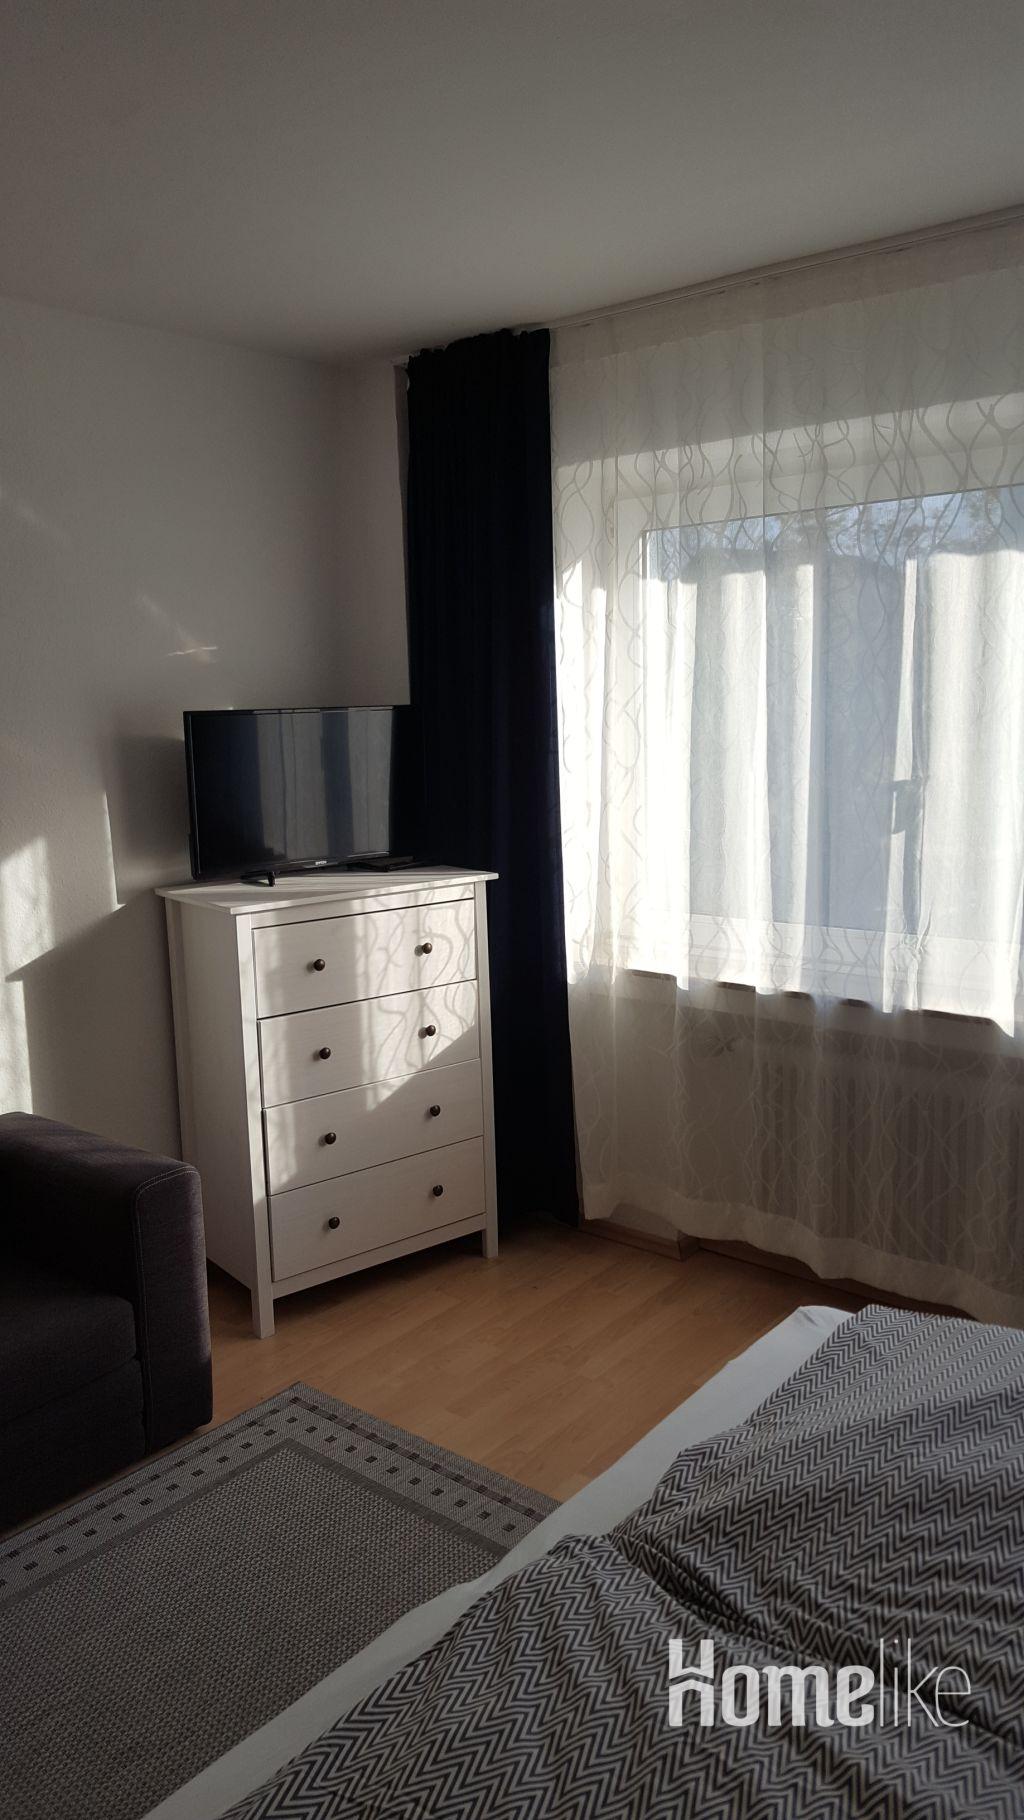 image 3 furnished 1 bedroom Apartment for rent in Golzheim, Dusseldorf